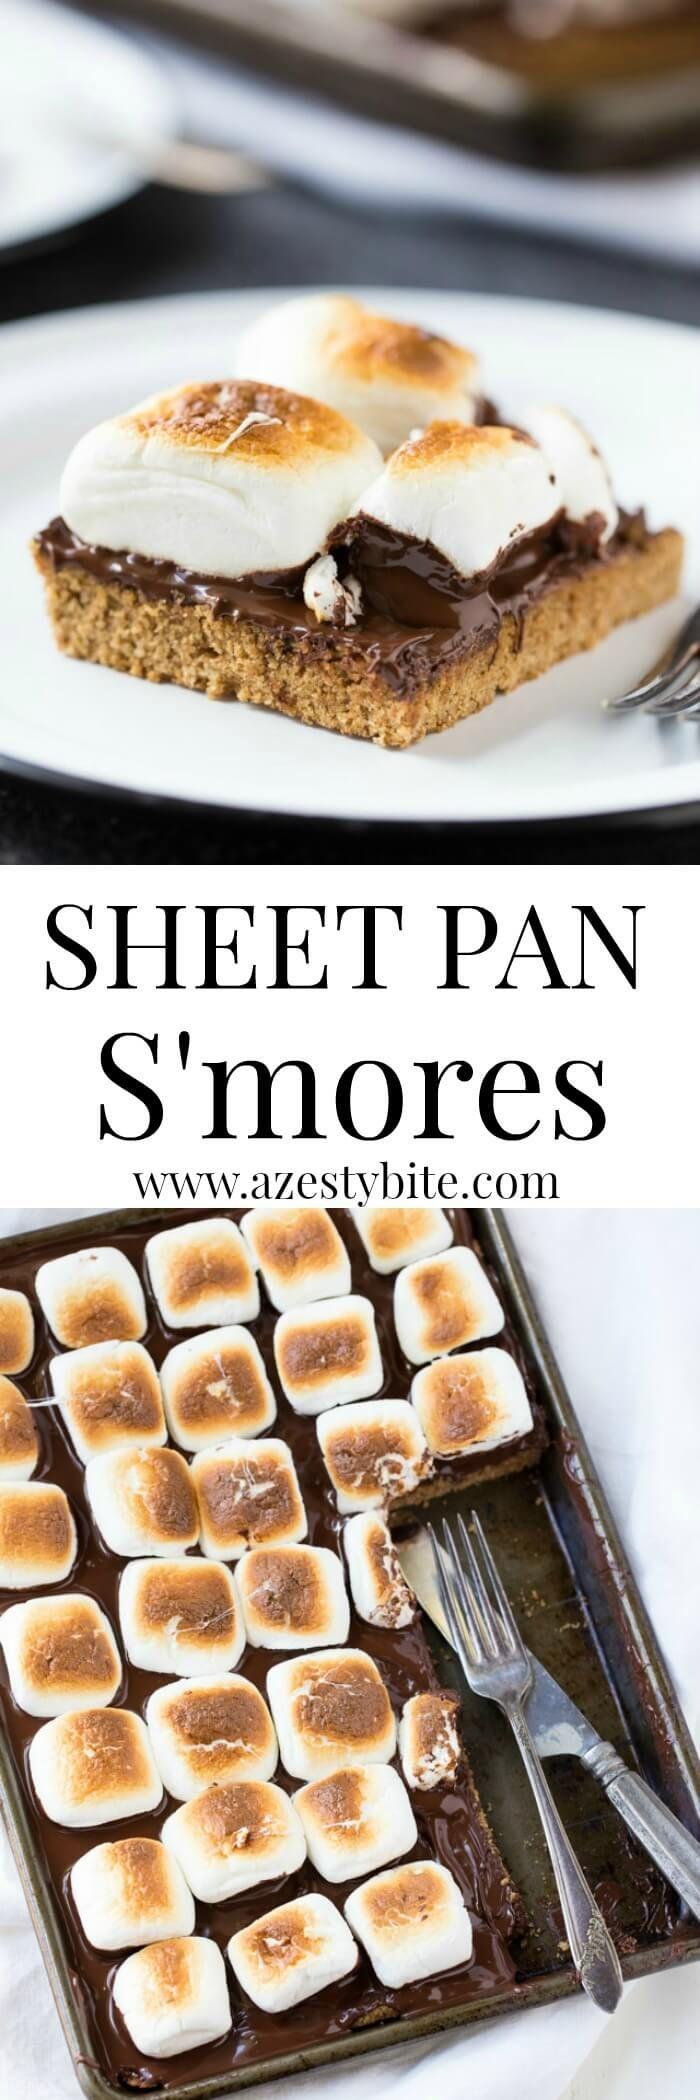 Sheet Pan S'mores